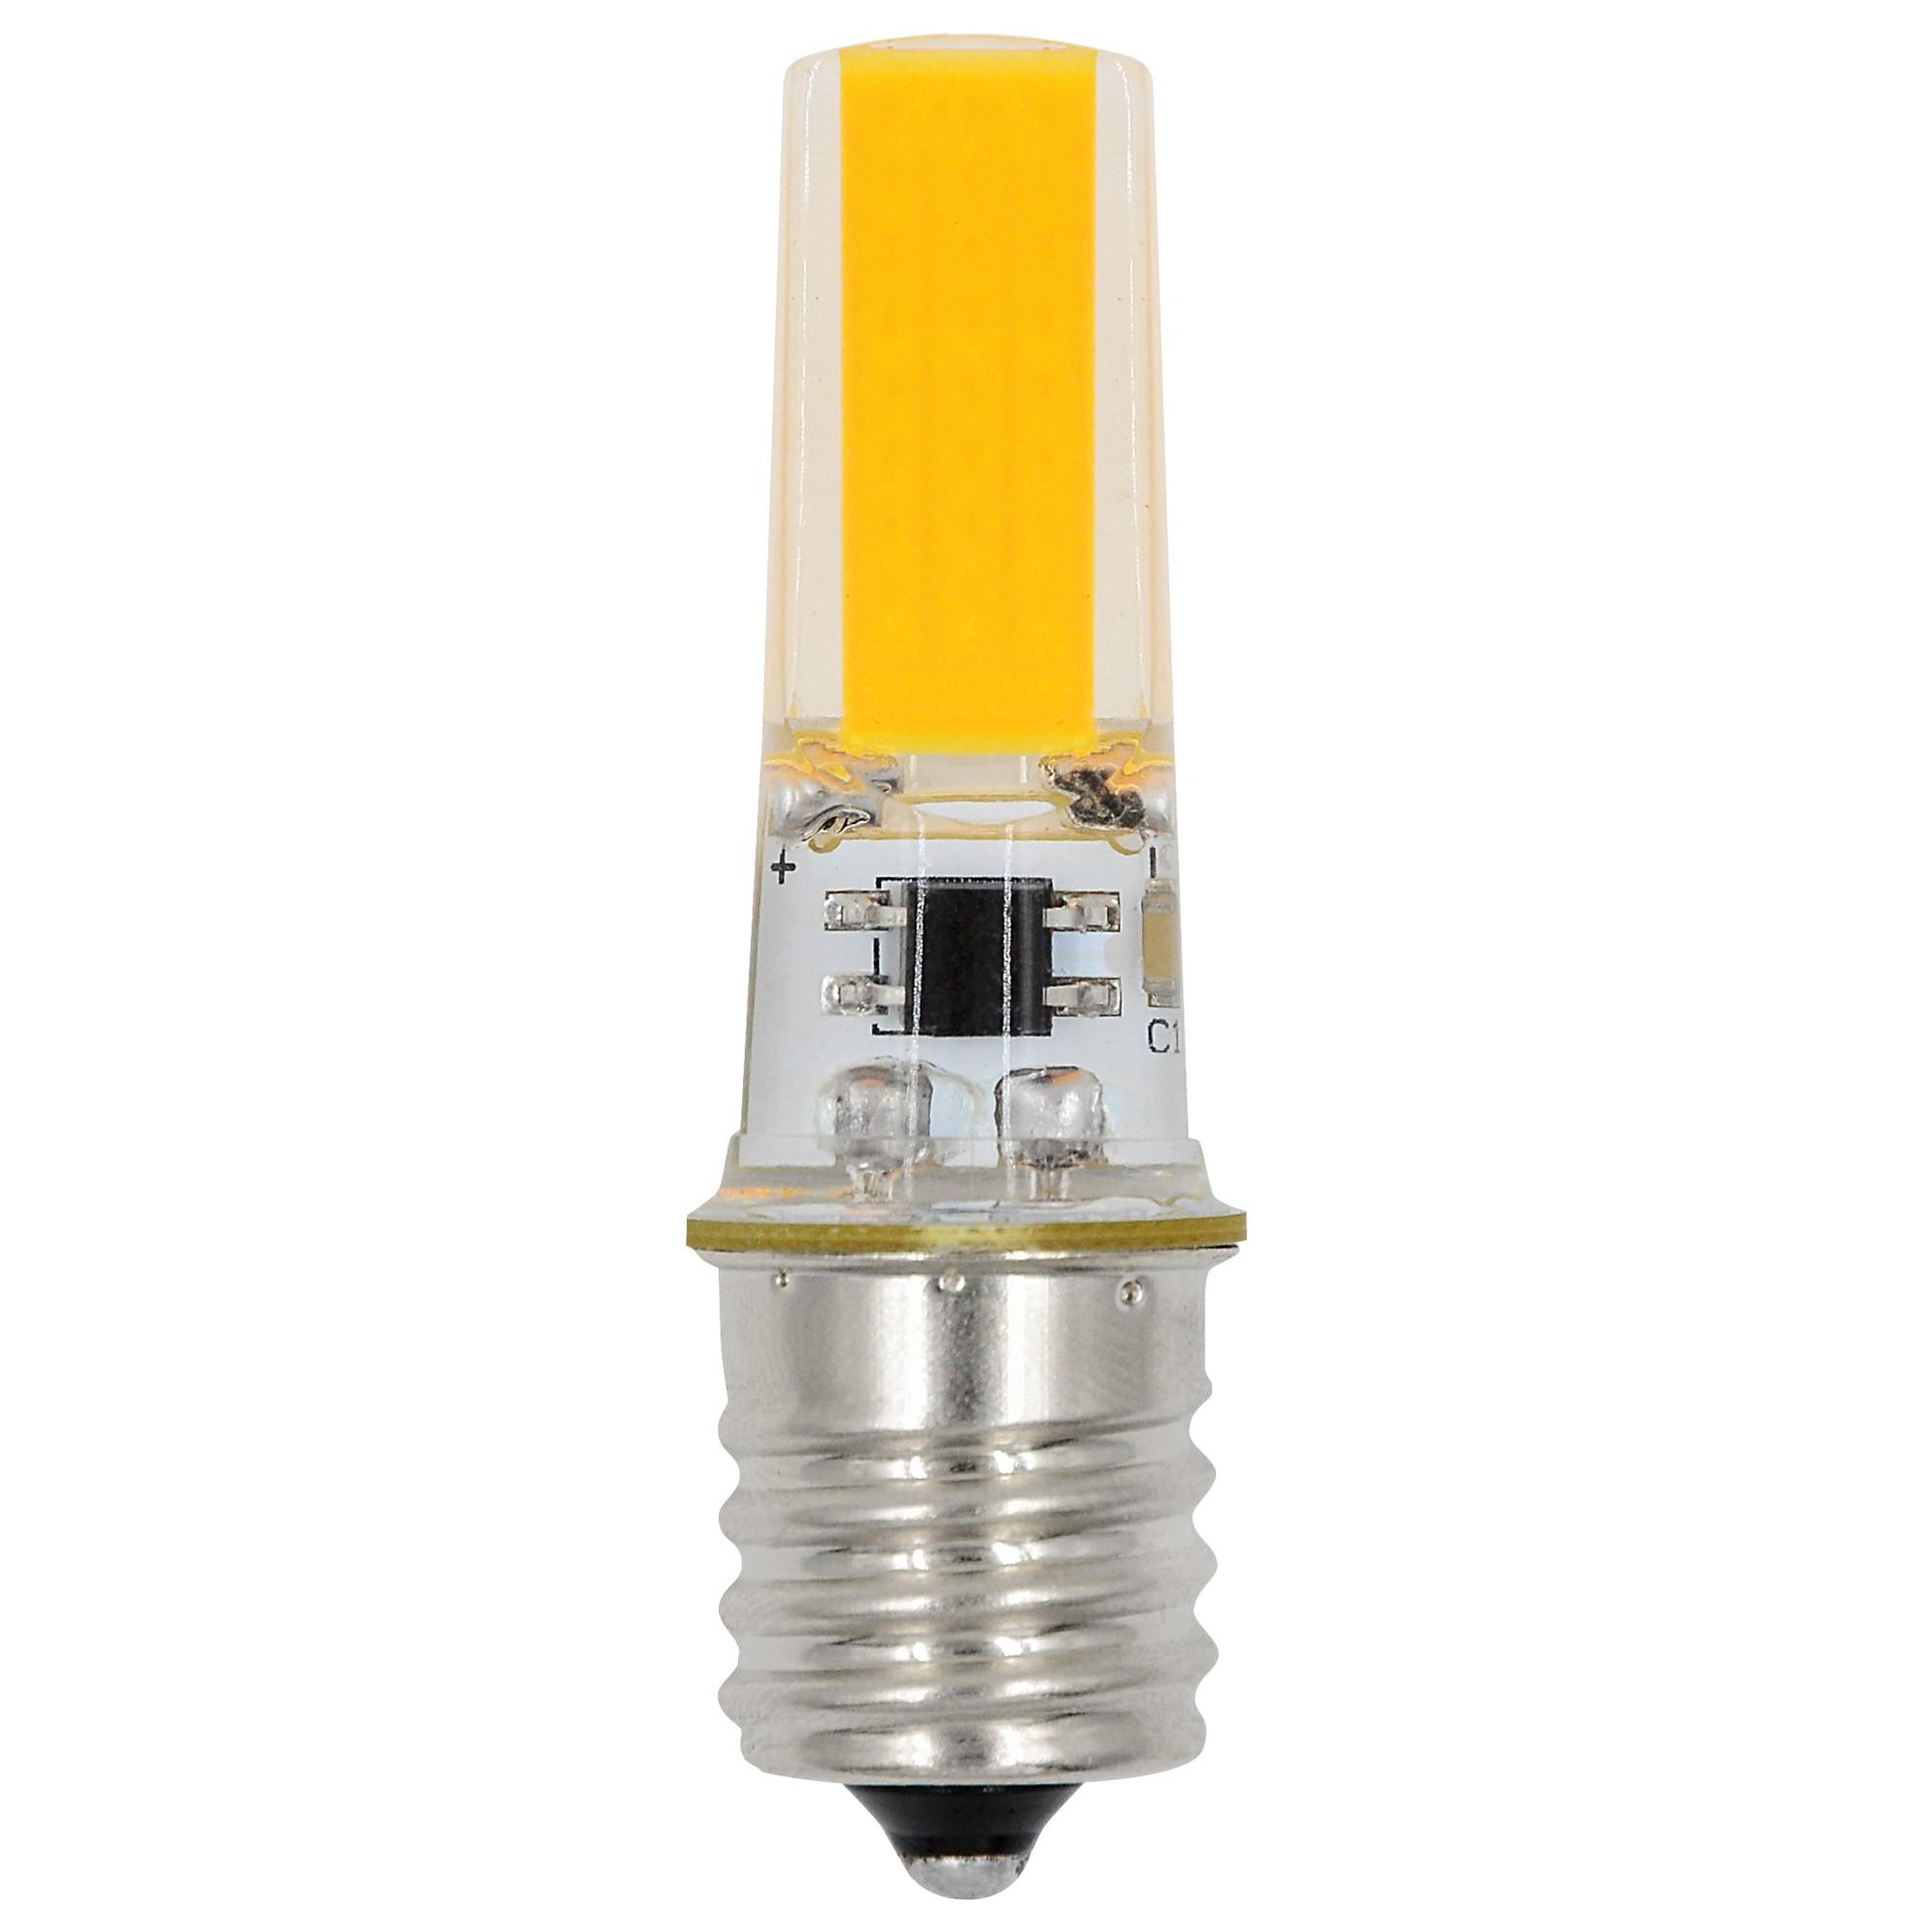 mengsled mengs e17 3w led light cob led bulb lamp ac. Black Bedroom Furniture Sets. Home Design Ideas